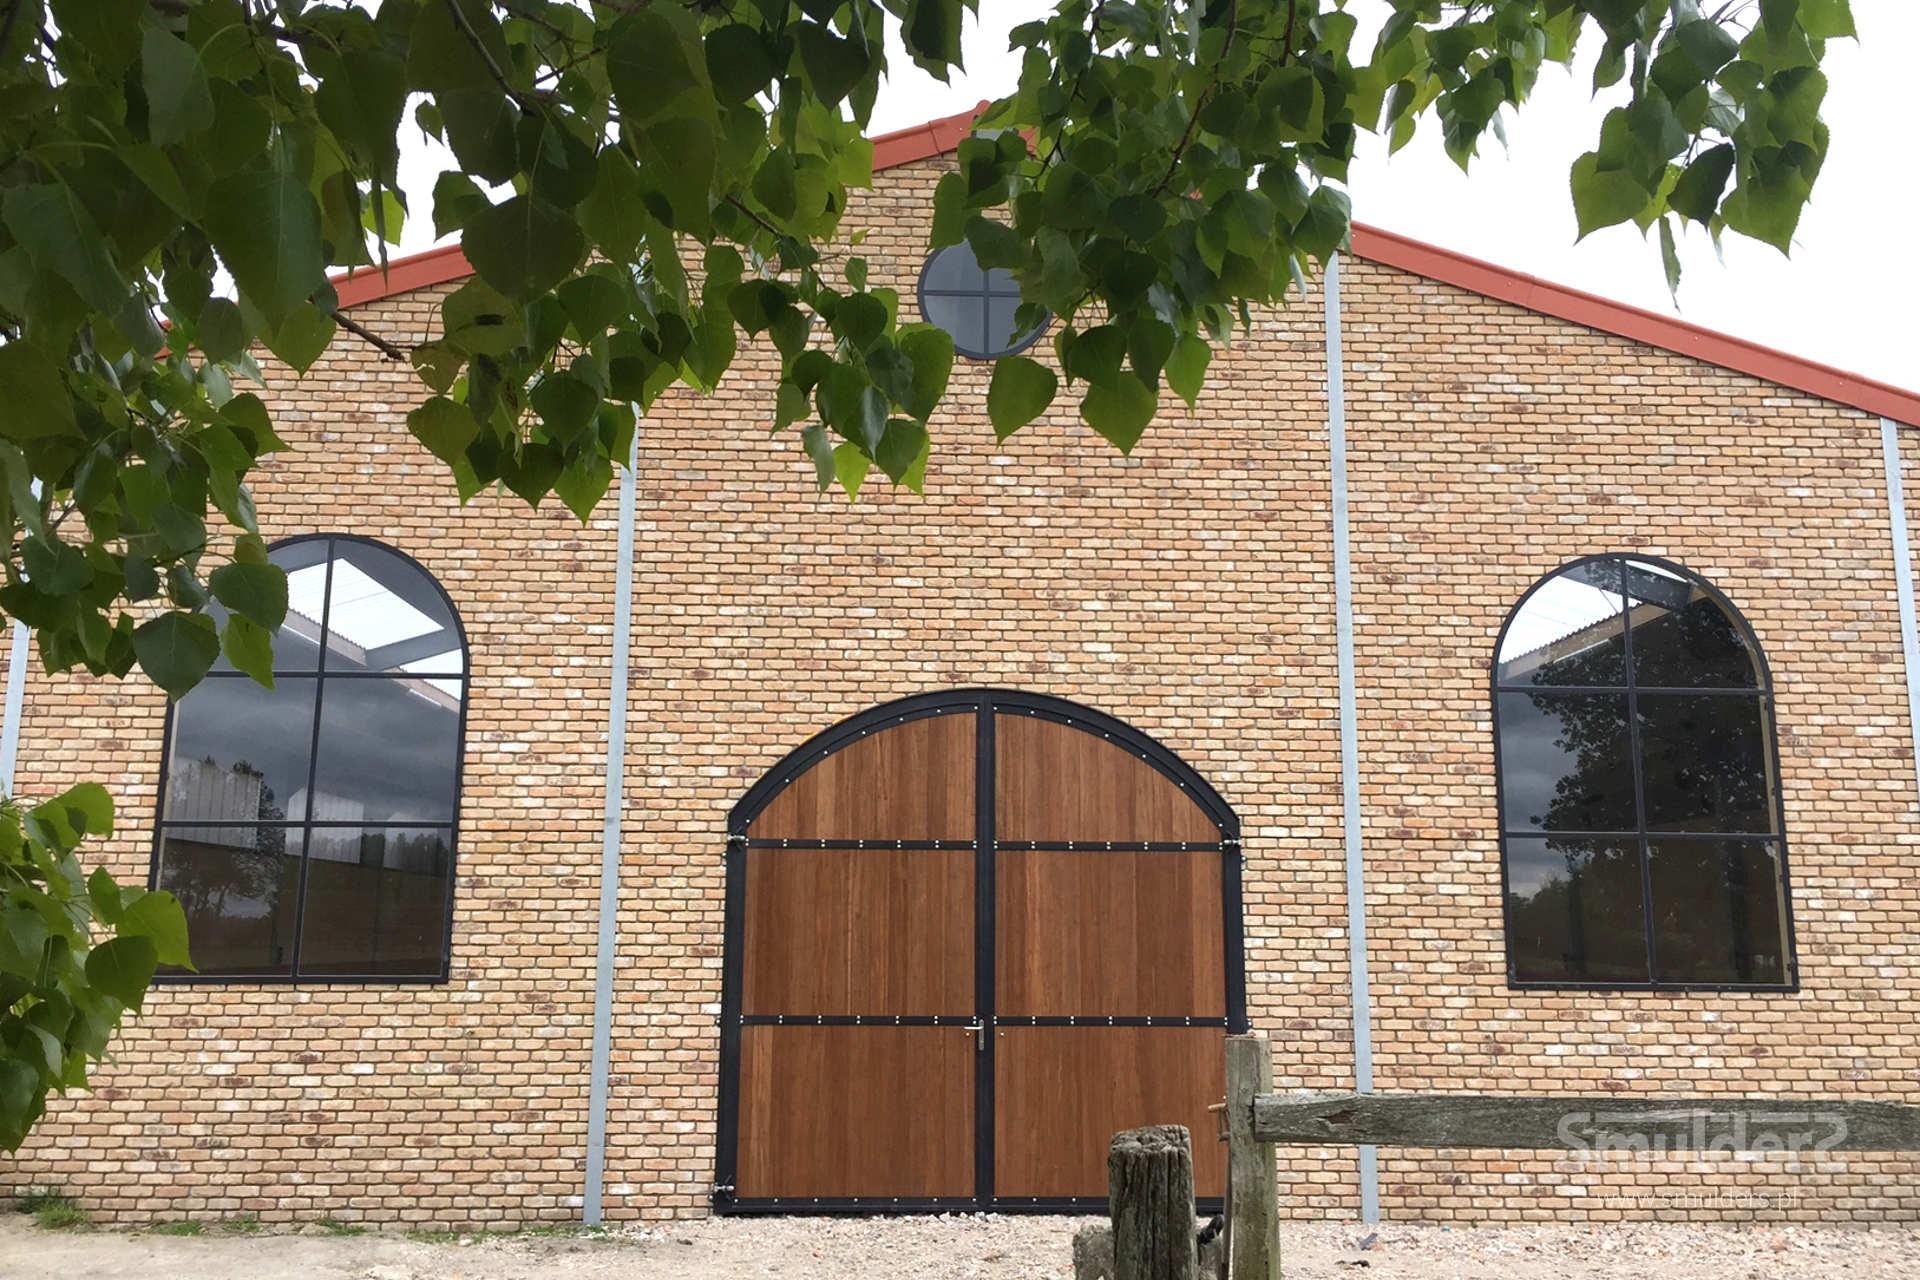 https://www.smulders.pl/wp-content/uploads/2019/03/f008_internal-stables_windsor_doors_windows_barn-doors_PRSH_SMULDERS_PL.jpg